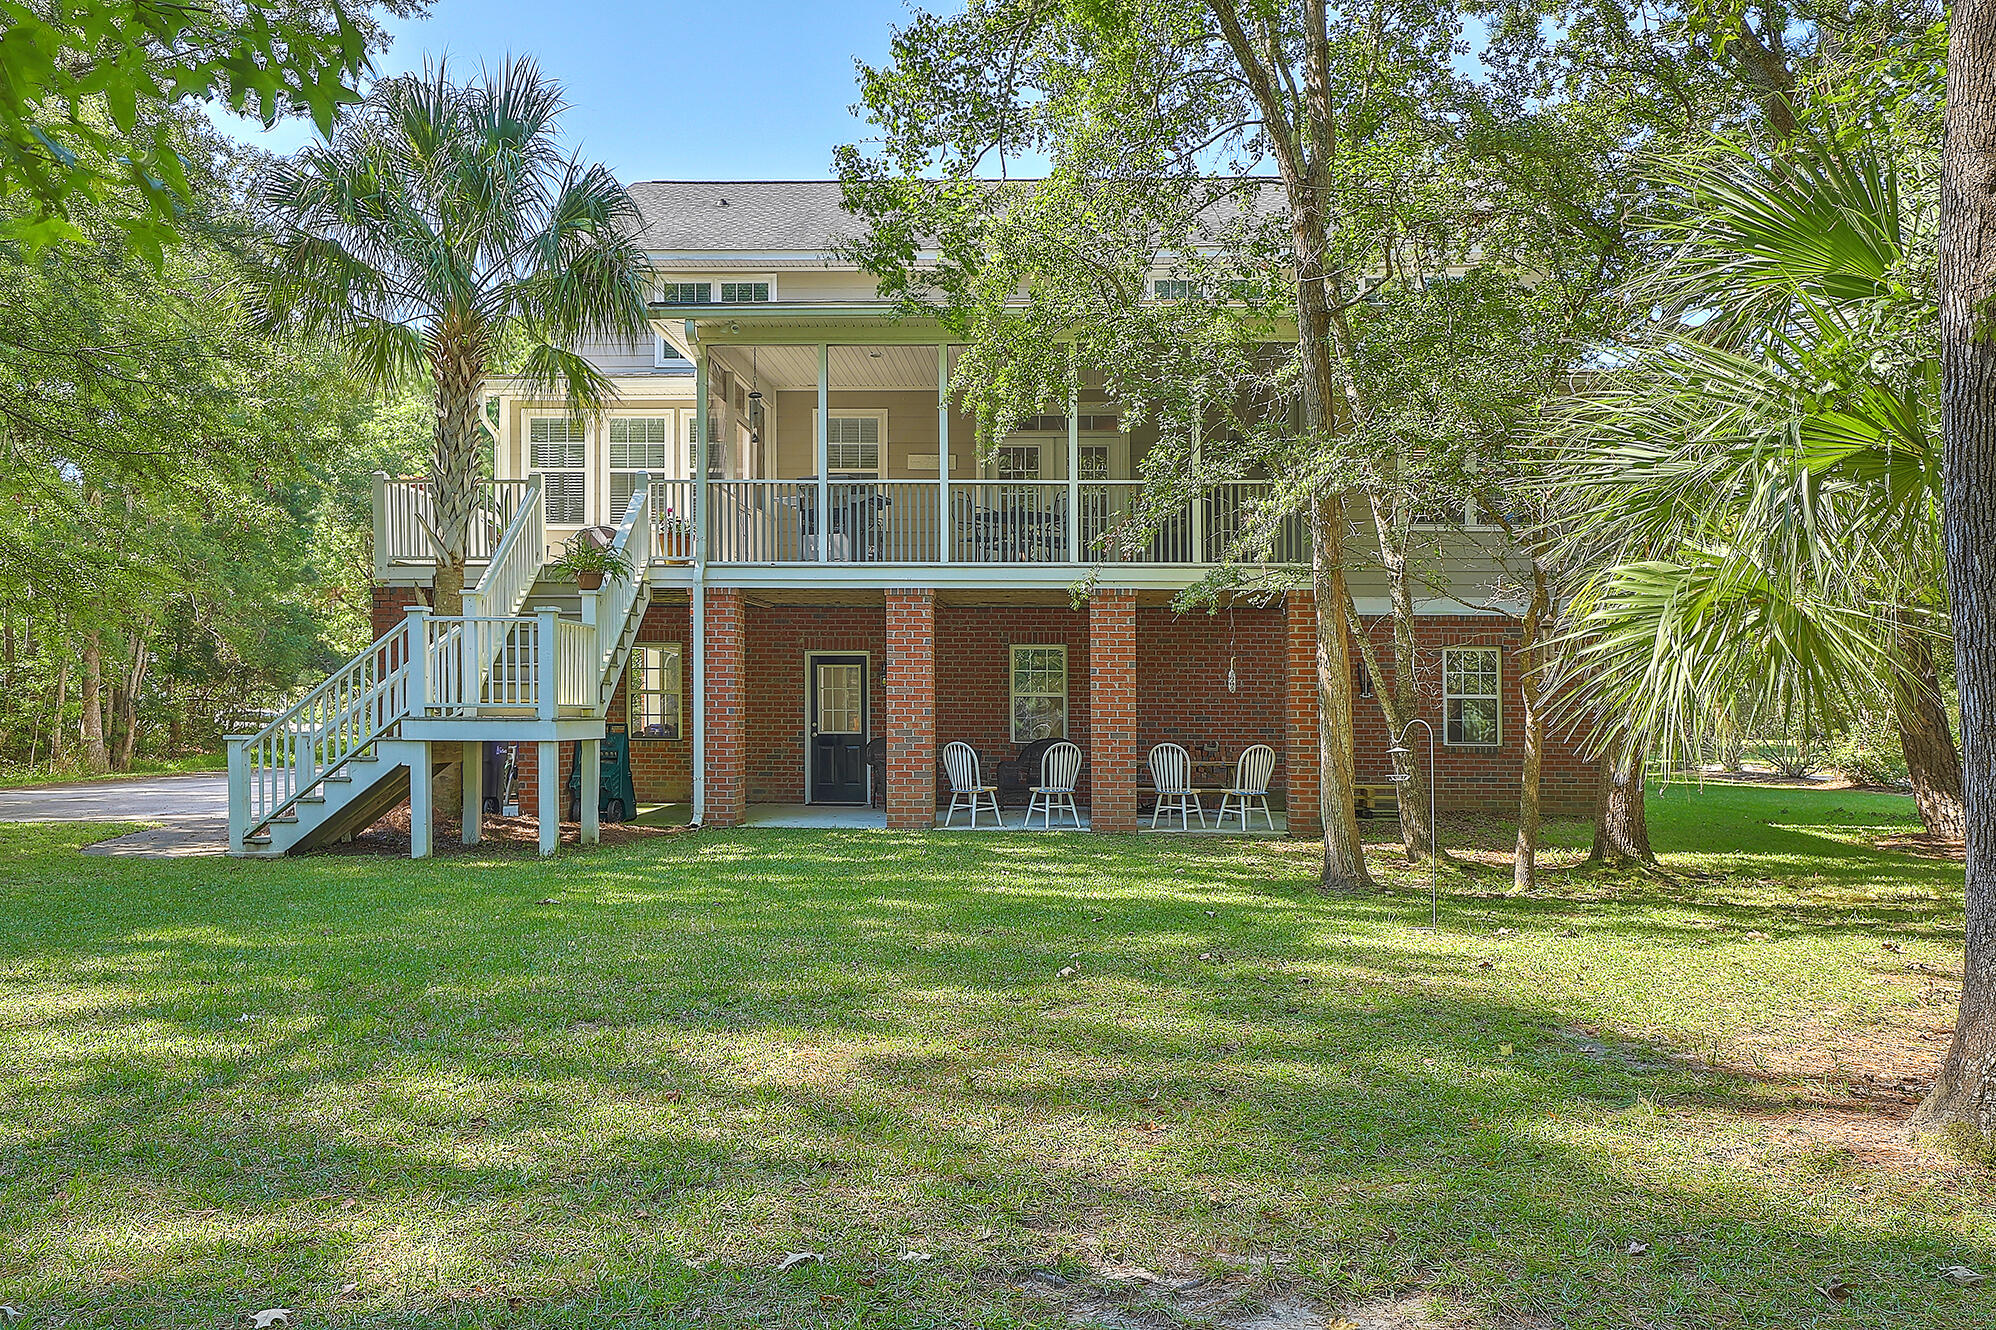 Darrell Creek Homes For Sale - 3750 Saint Ellens, Mount Pleasant, SC - 54